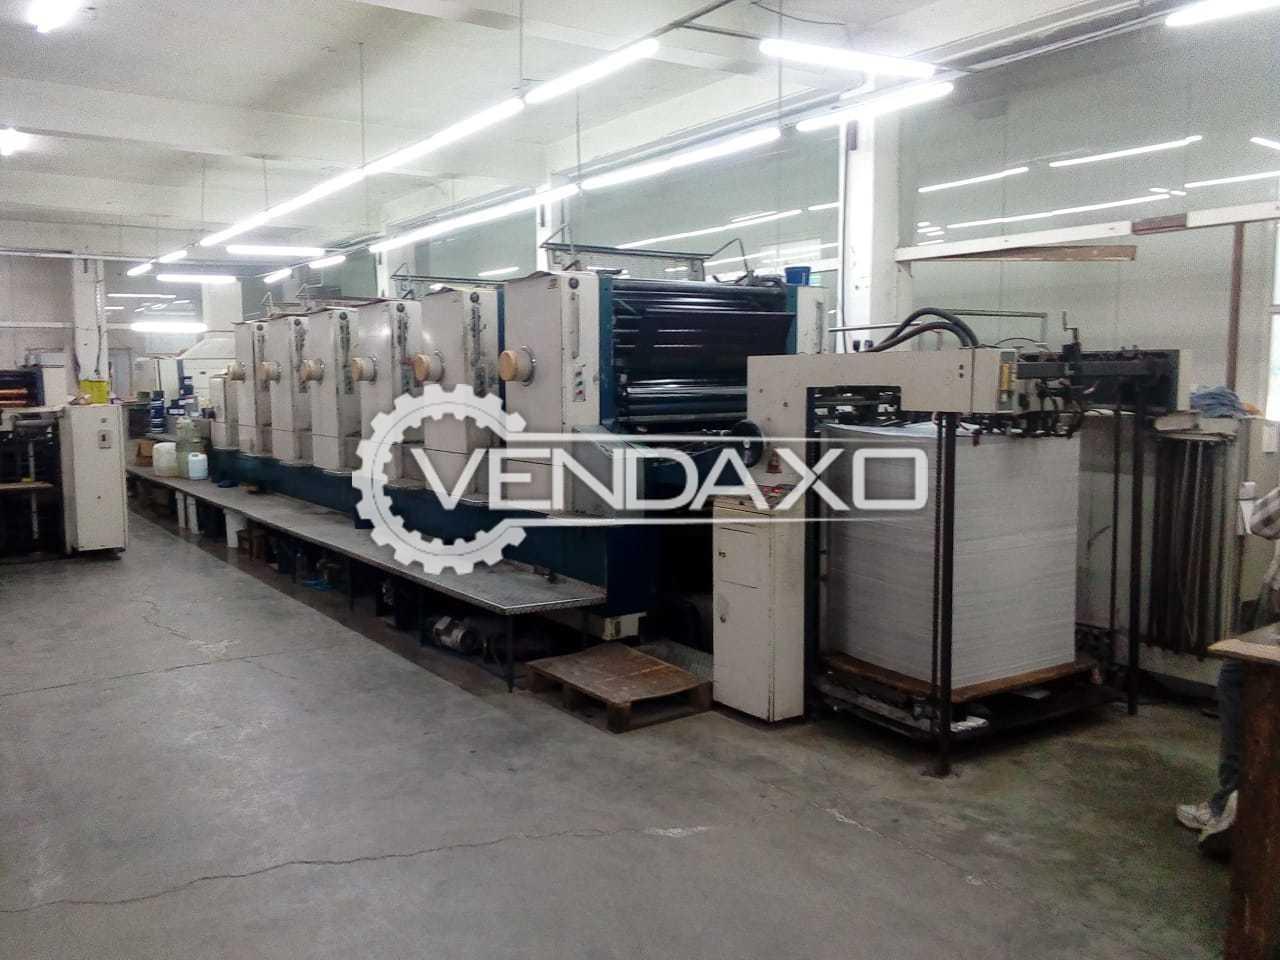 Komori Lithrone 640 Offset Printing Machine - 28 x 40 Inch, 6 Color